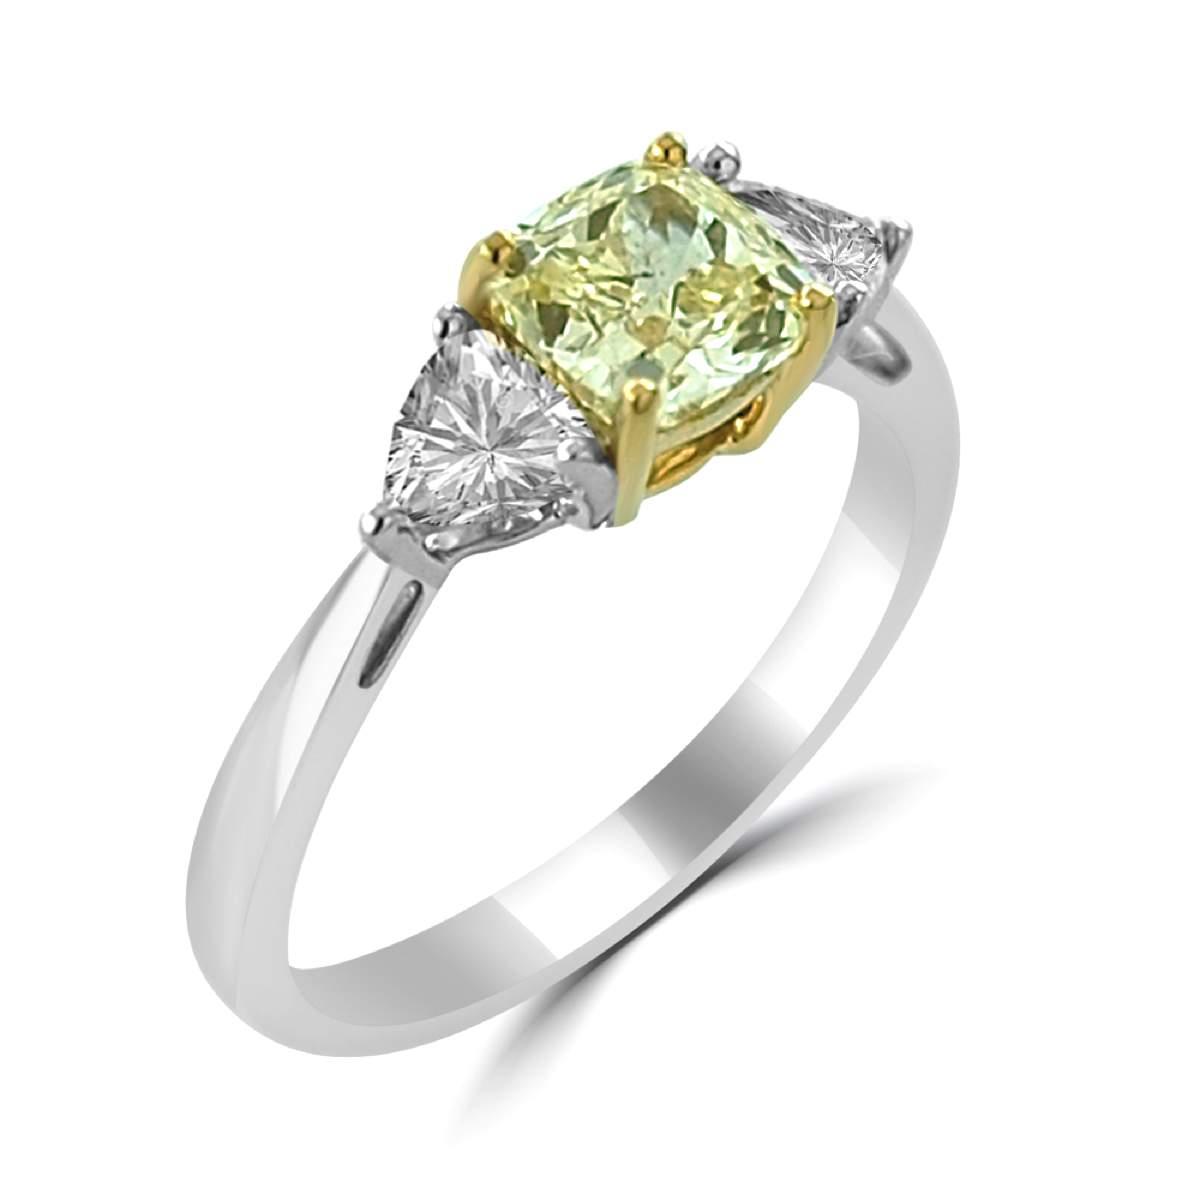 154Ct Yellow Cushion Cut and Trillion Diamond Three Stone Ring In 18K Yellow Gold (1)